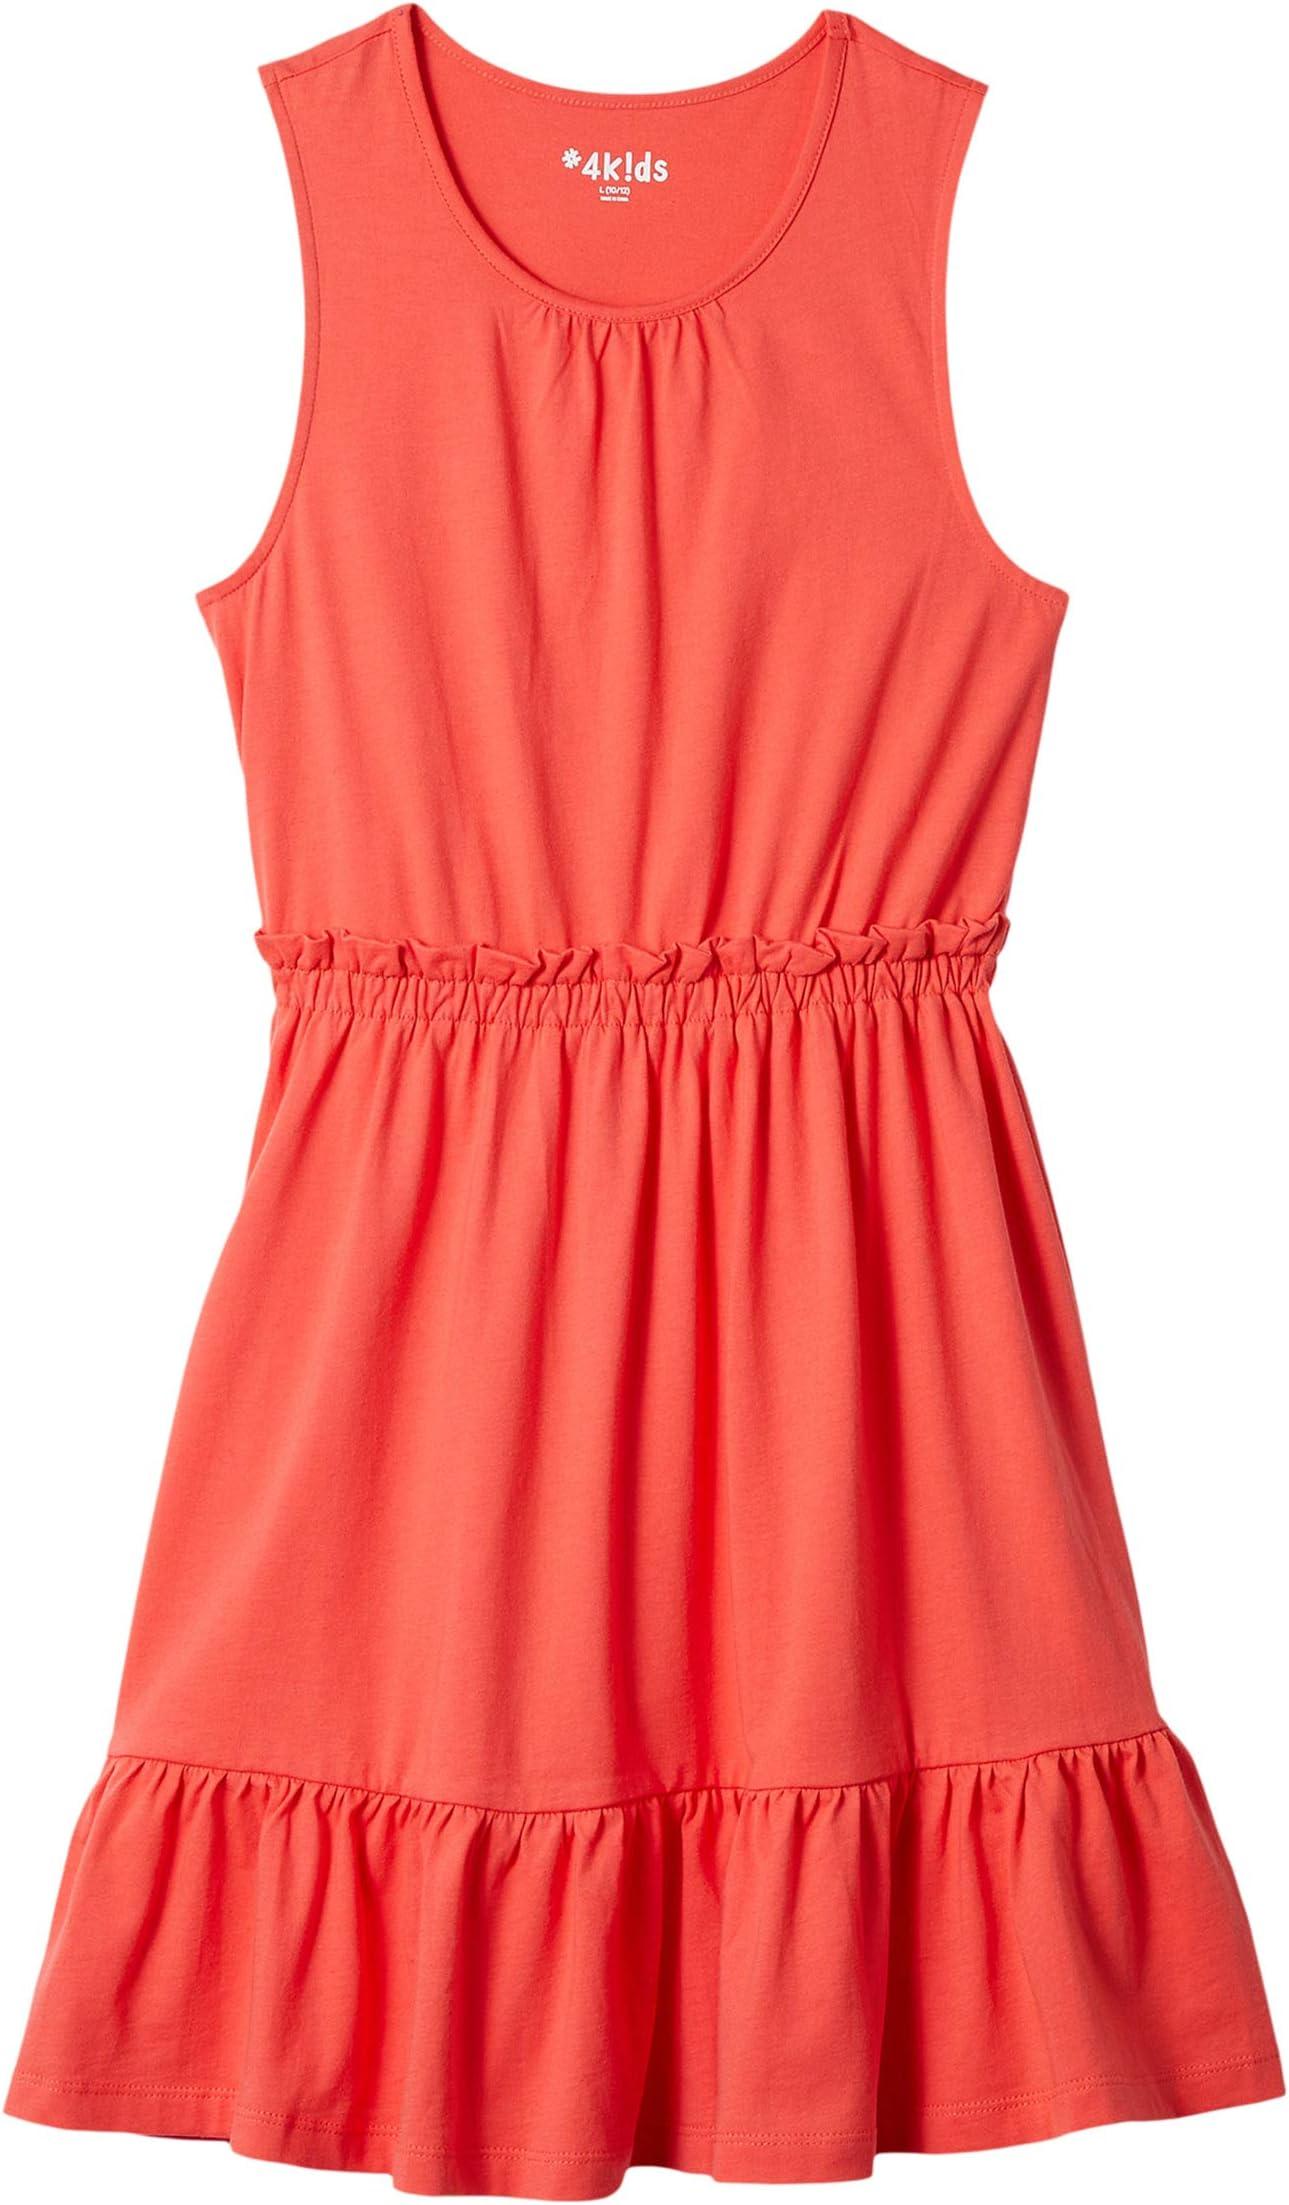 #4k!ds™ Essential Tiered Dress